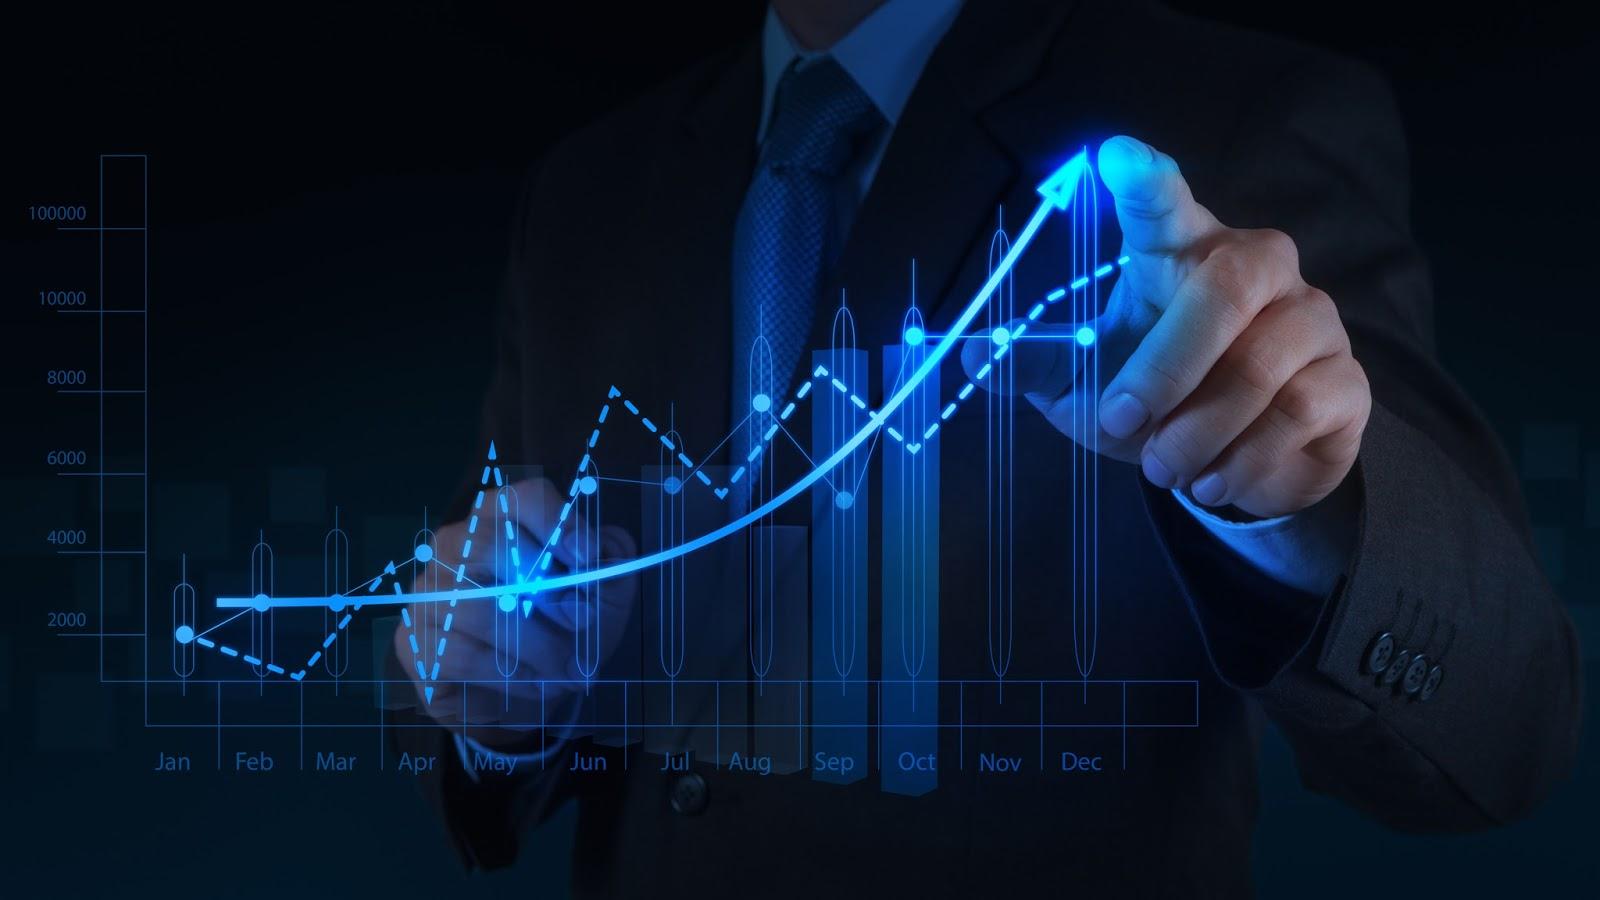 House Prices Prediction - Kaggle